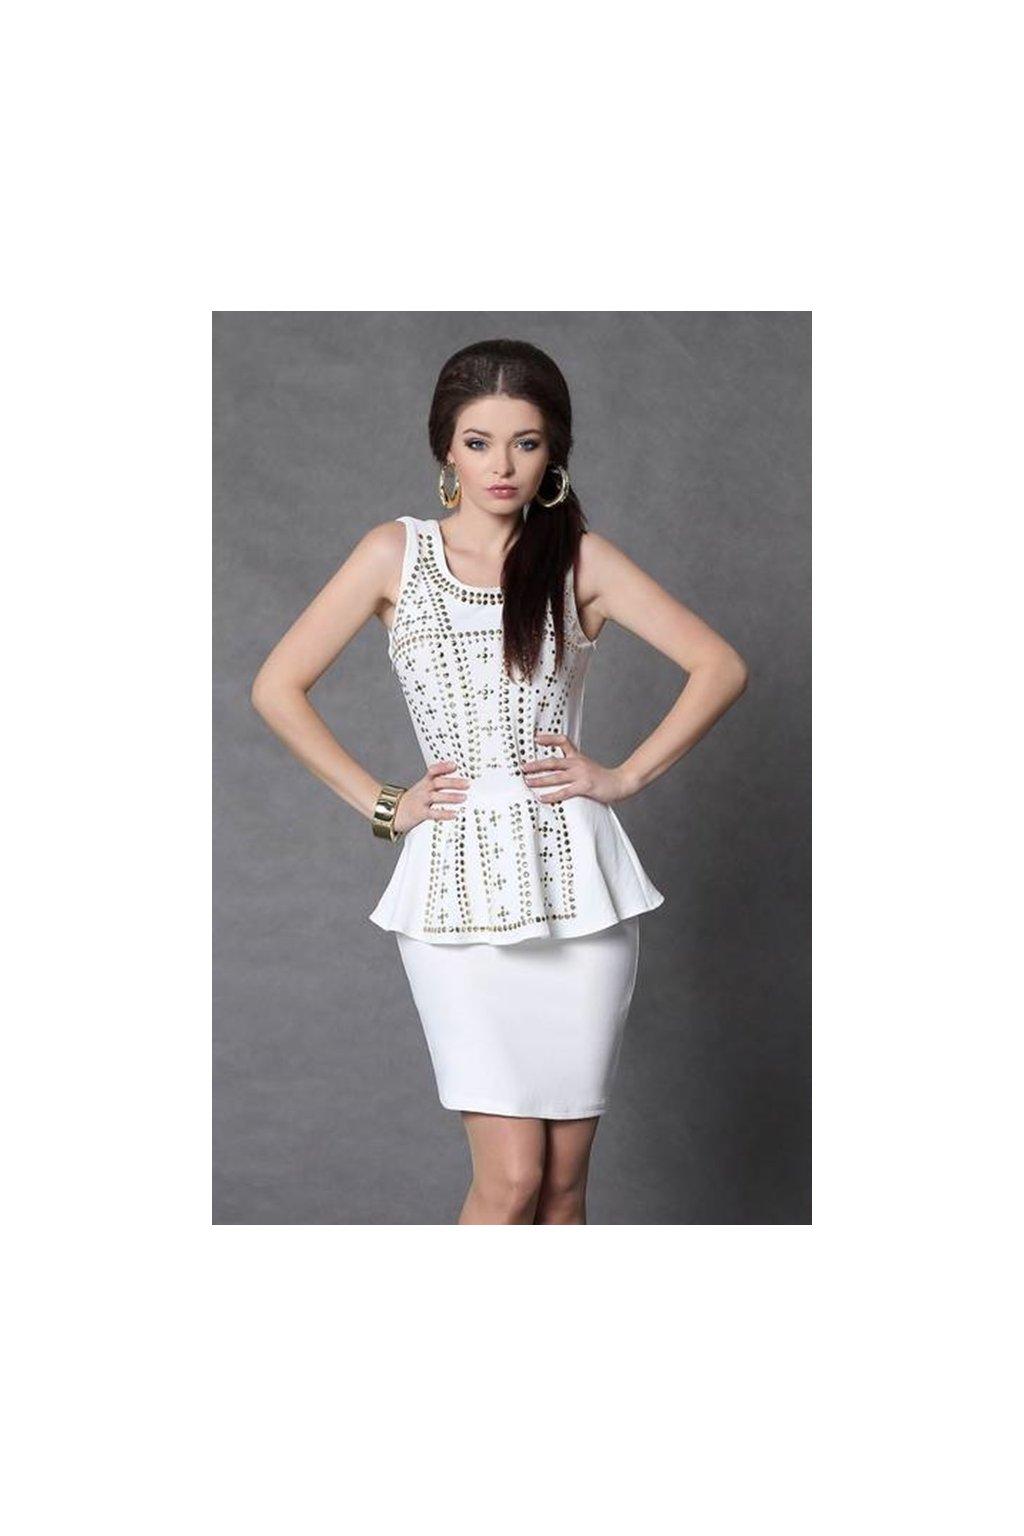 Elegantné peplum šaty s vybíjaním-Tentation.sk 30ebc0395c